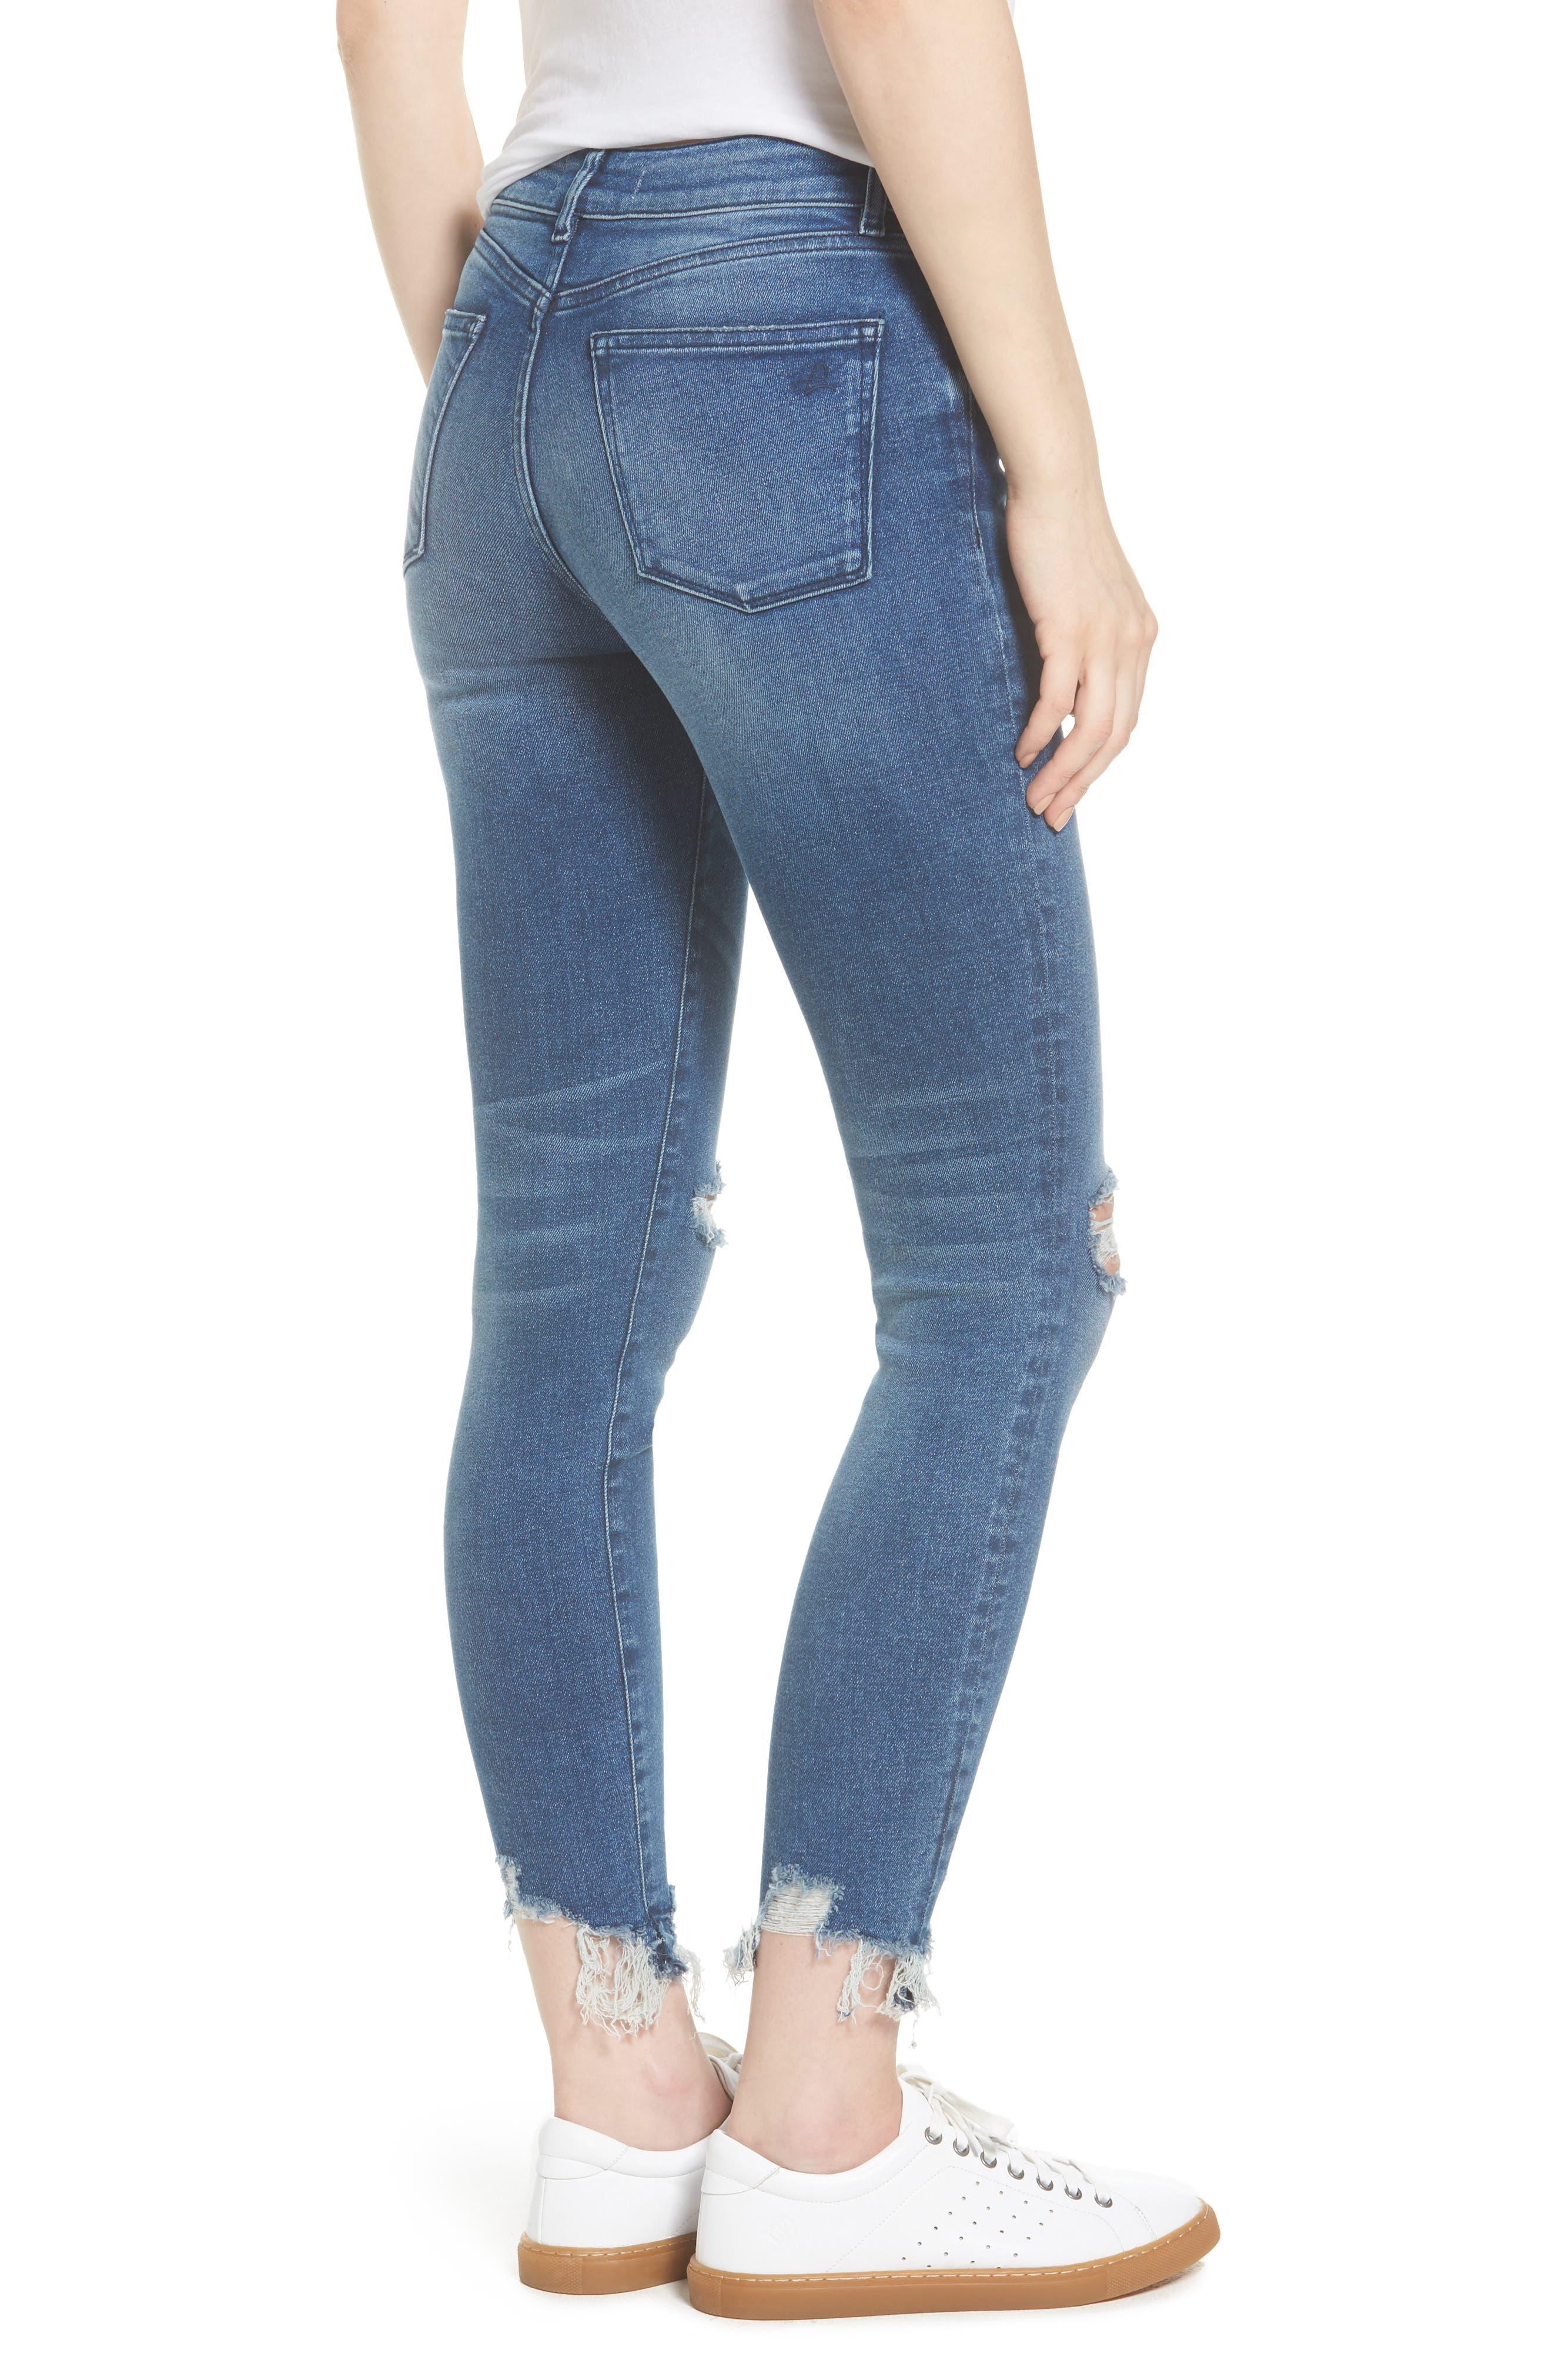 Farrow Instaslim High Waist Ankle Skinny Jeans,                             Alternate thumbnail 2, color,                             Laramie